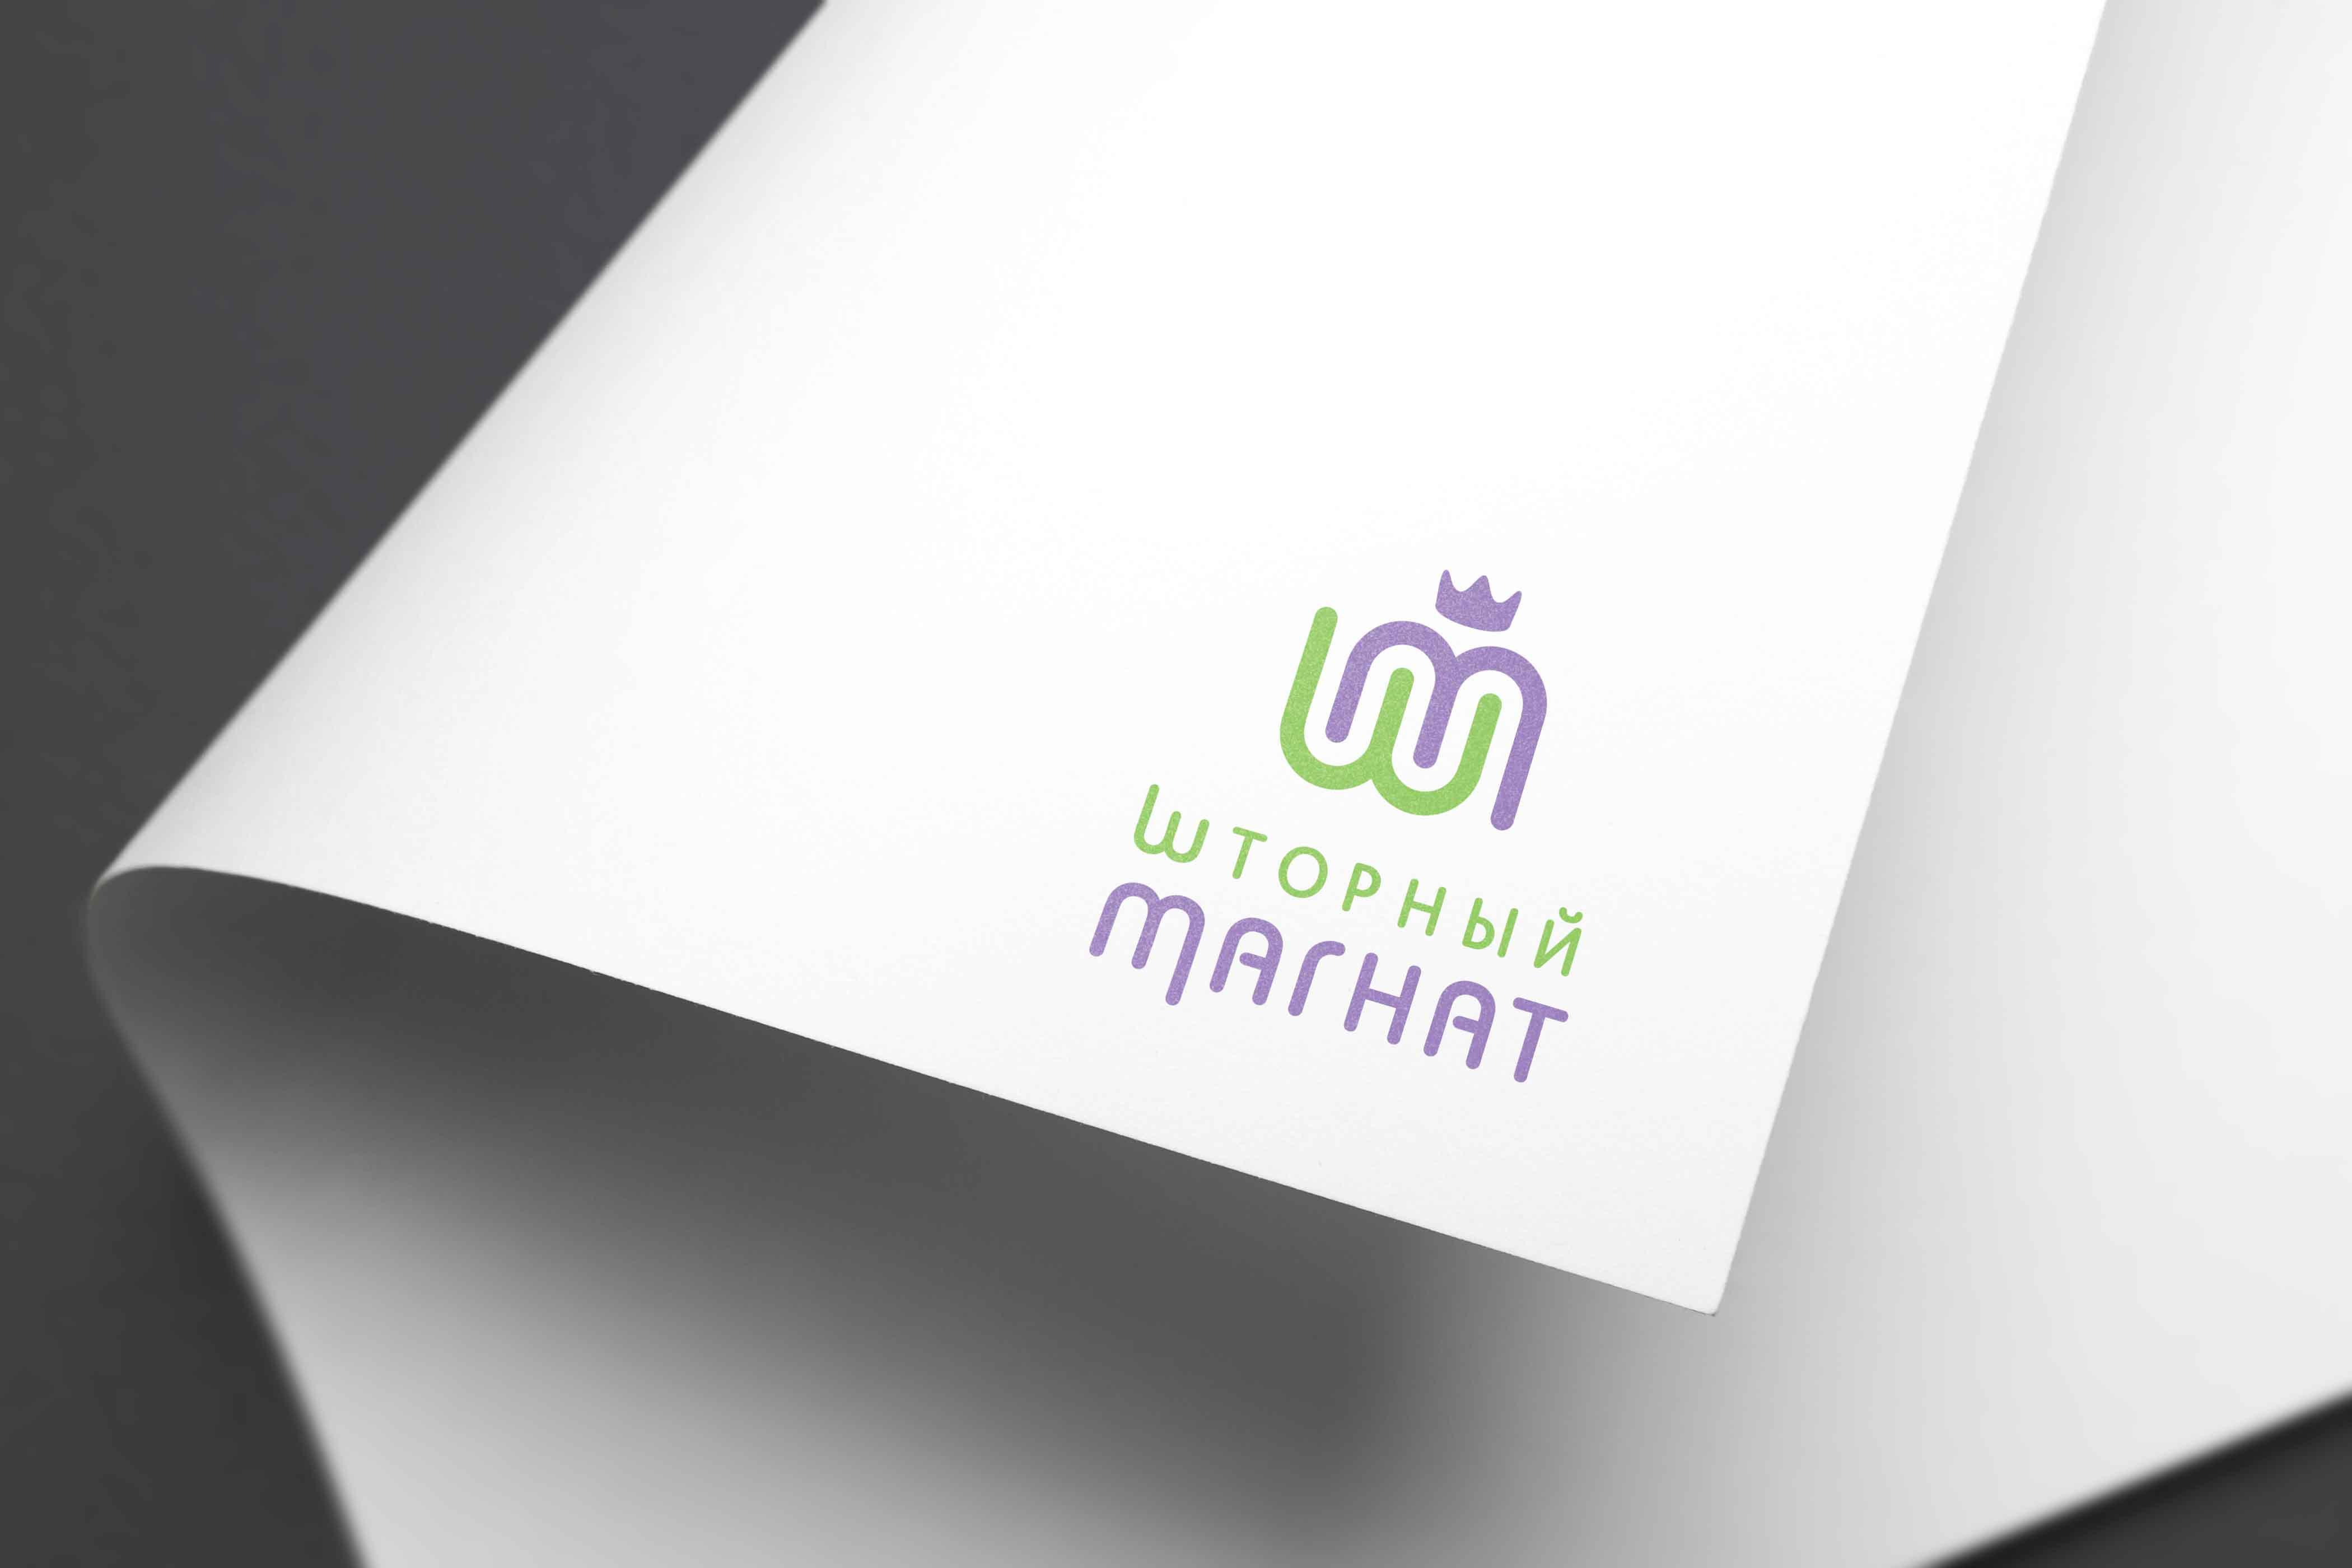 Логотип и фирменный стиль для магазина тканей. фото f_2425cddbc3a89e7a.jpg